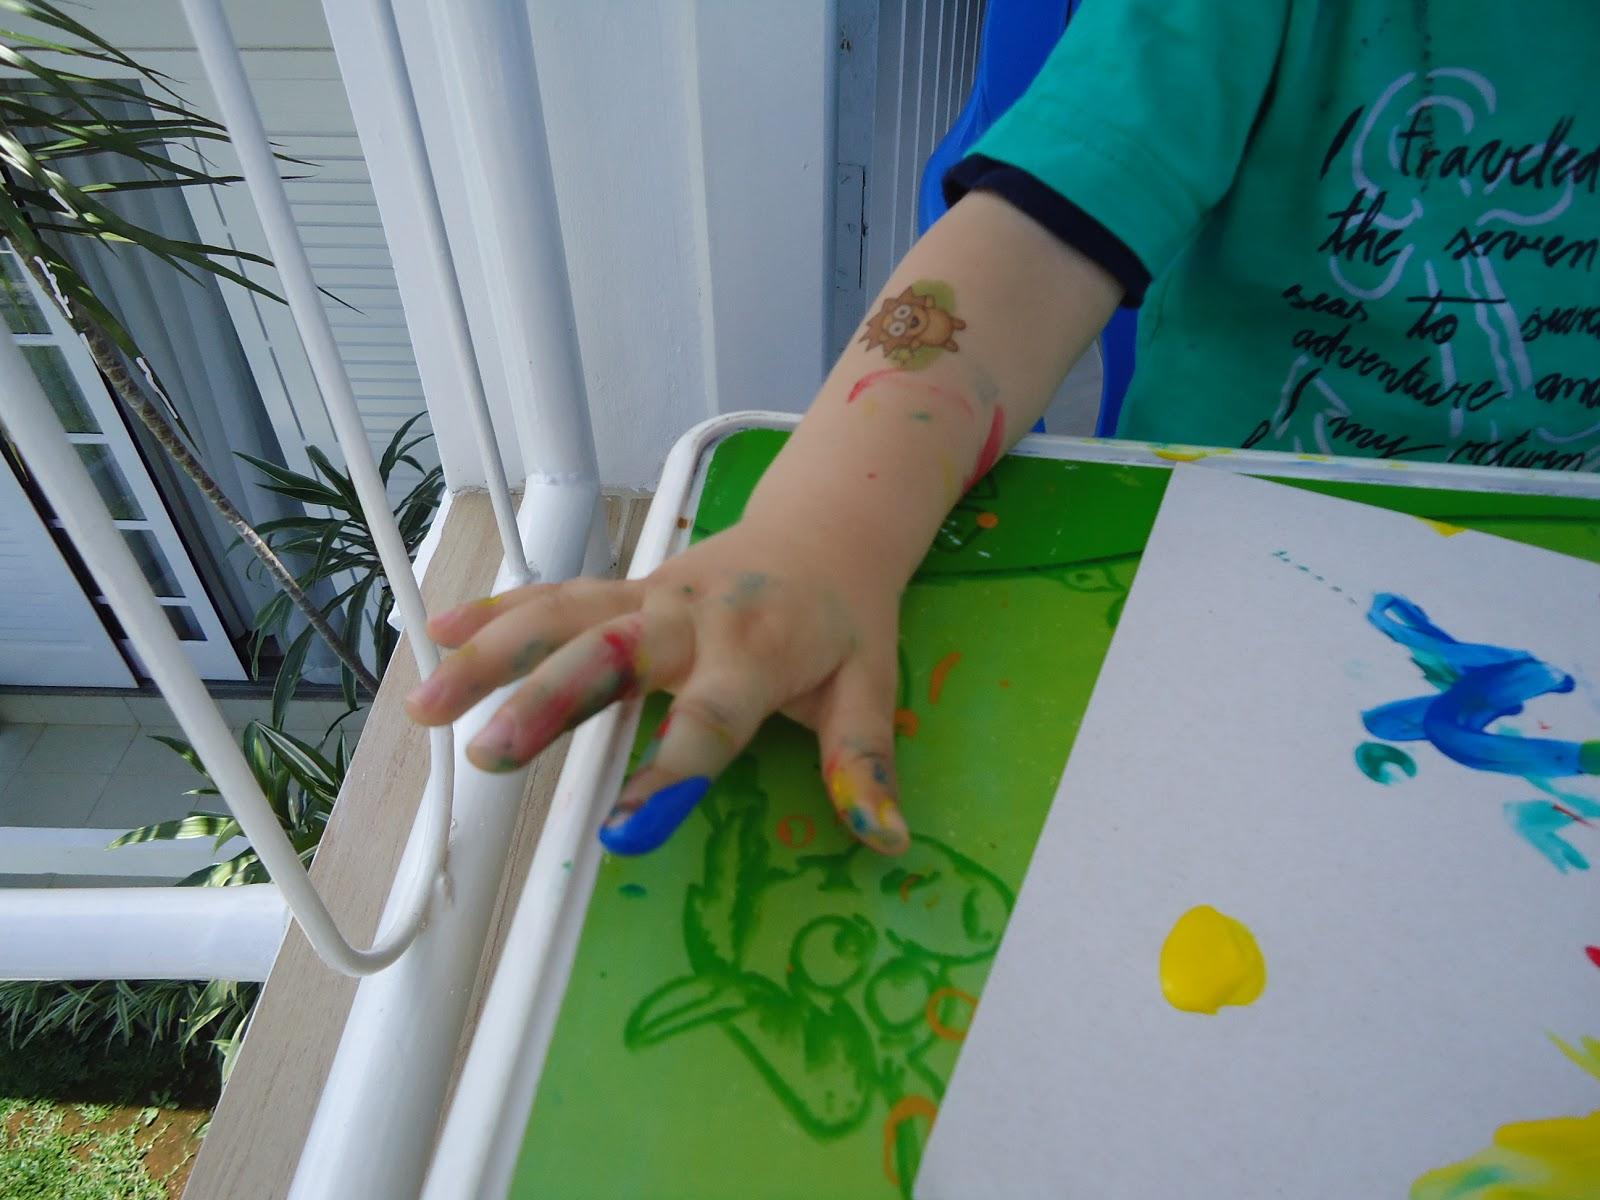 Pintando com tinta